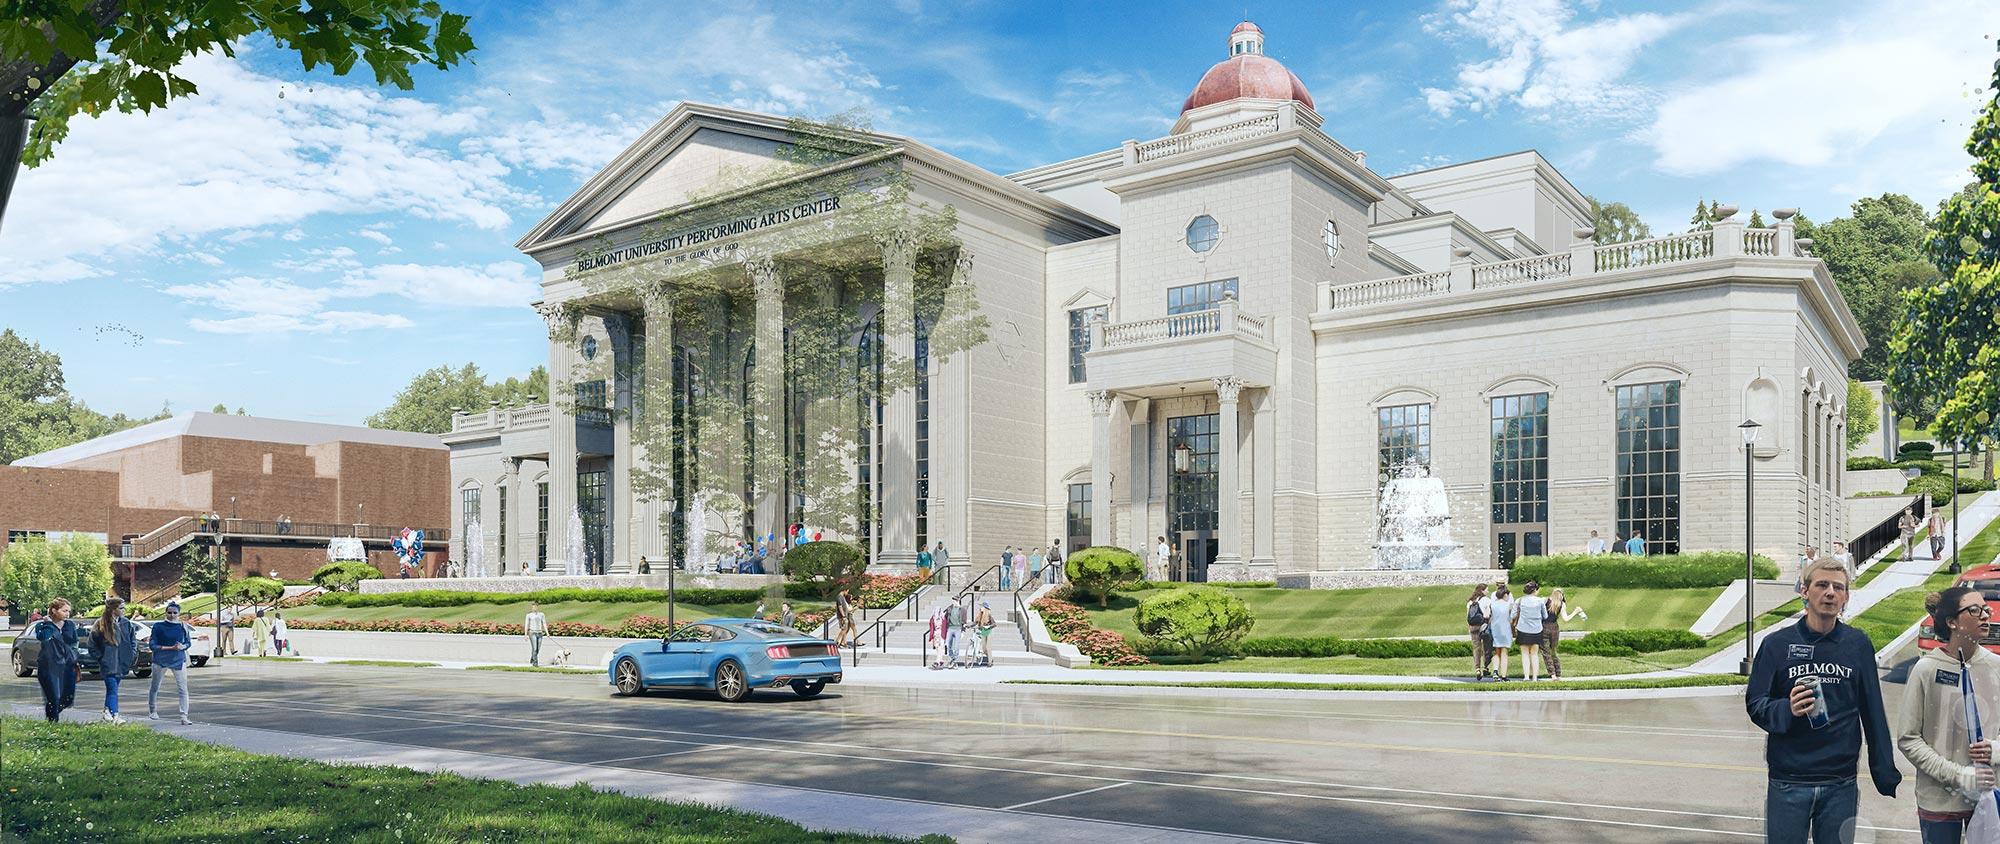 Belmont University Performing Arts Center